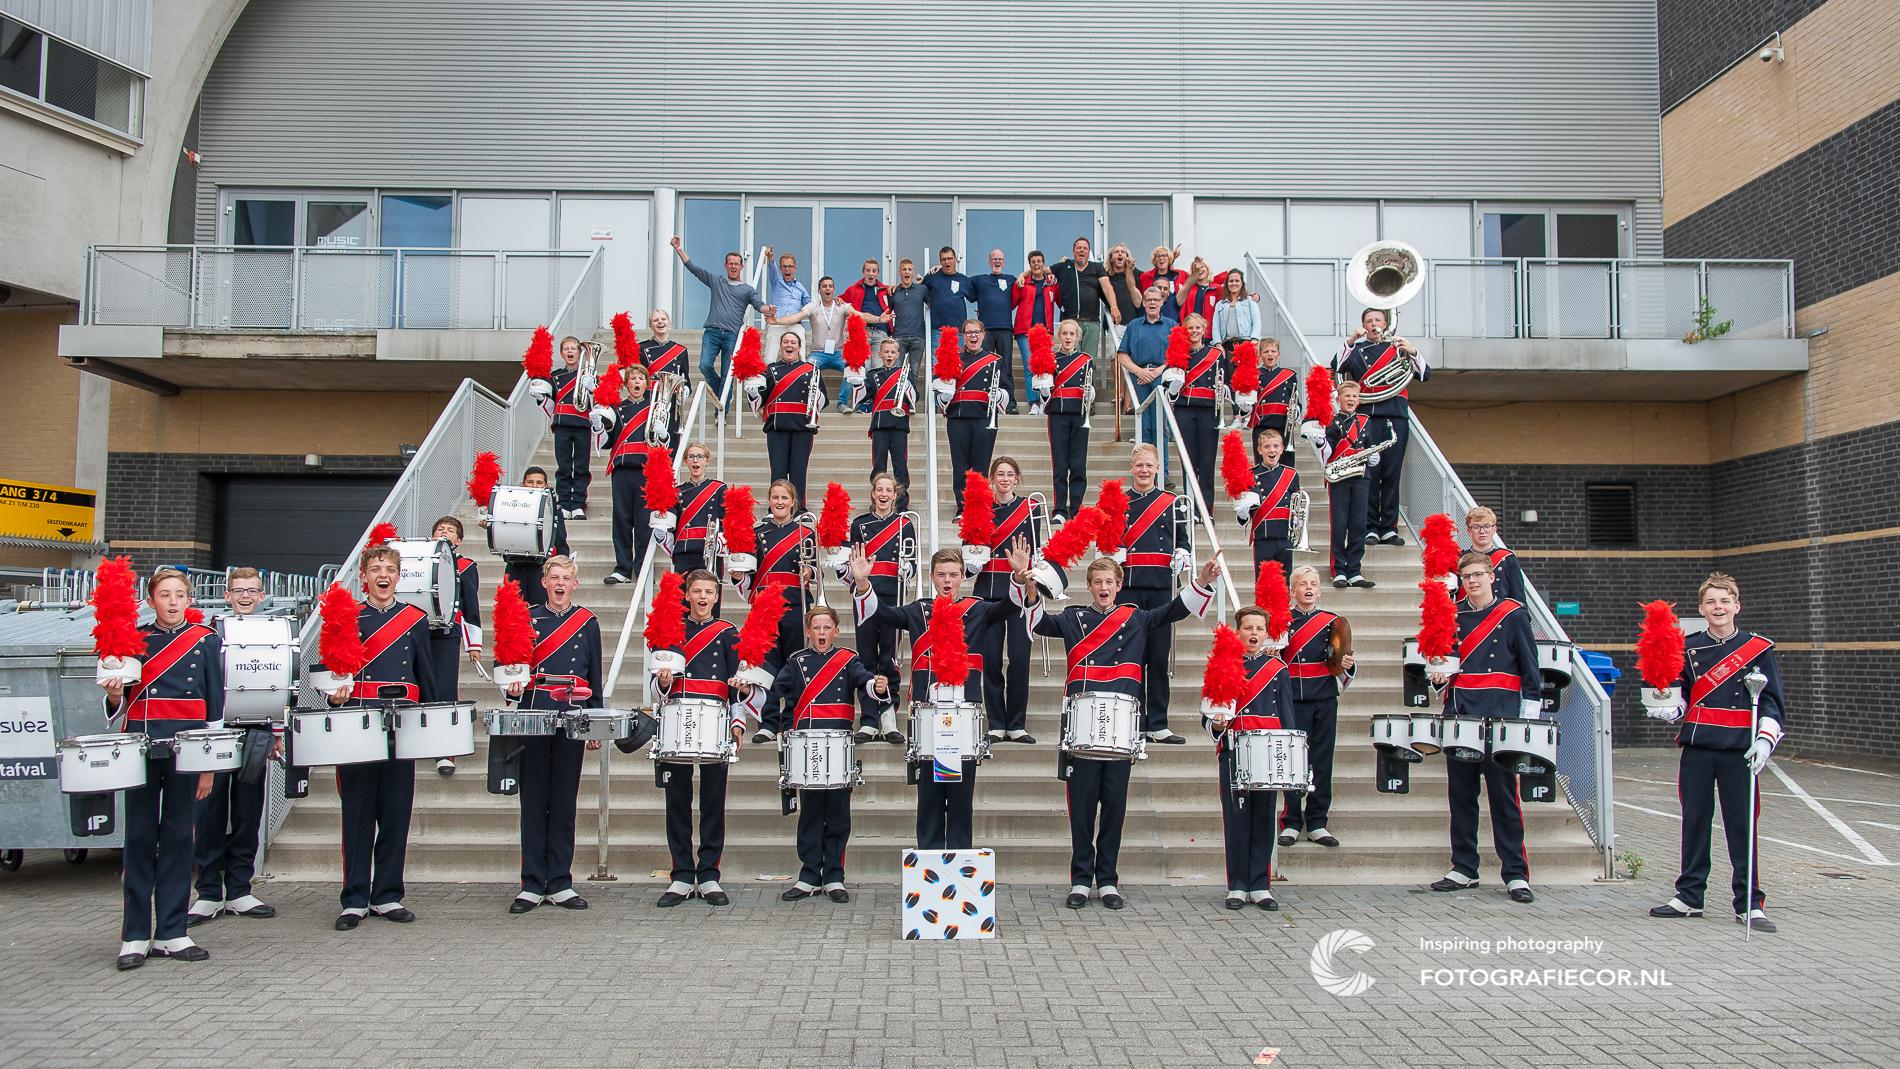 Groepsfoto | WMC | Kerkrade | zilver | KTK | Kampen | concours | wereld | muziek | event | fotografie